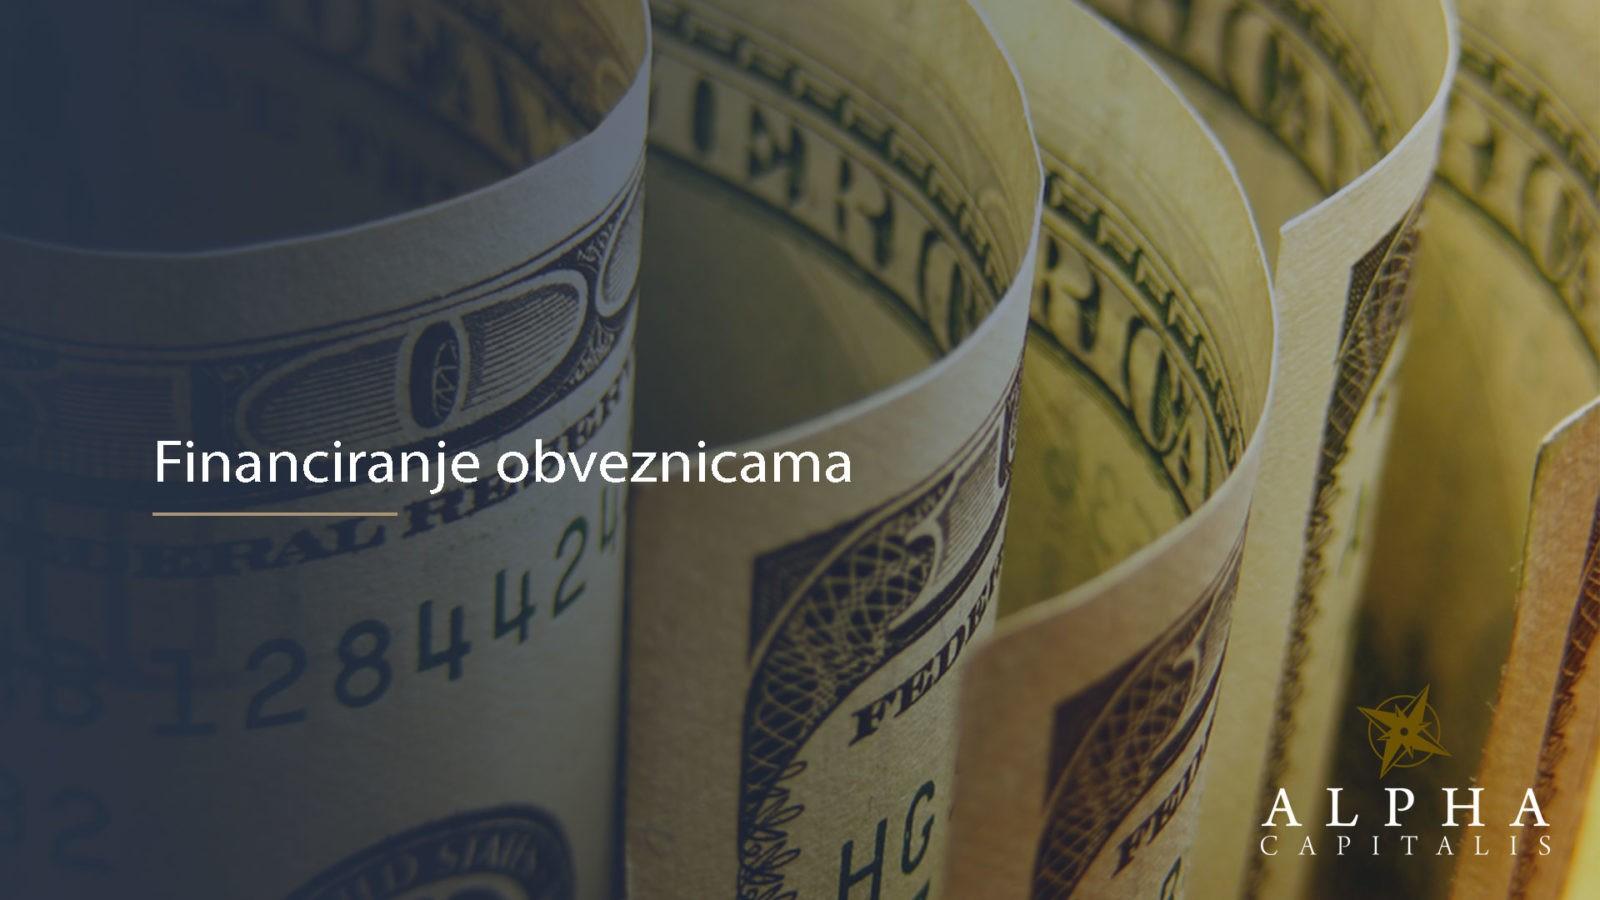 Financiranje obveznicama - Financiranje obveznicama